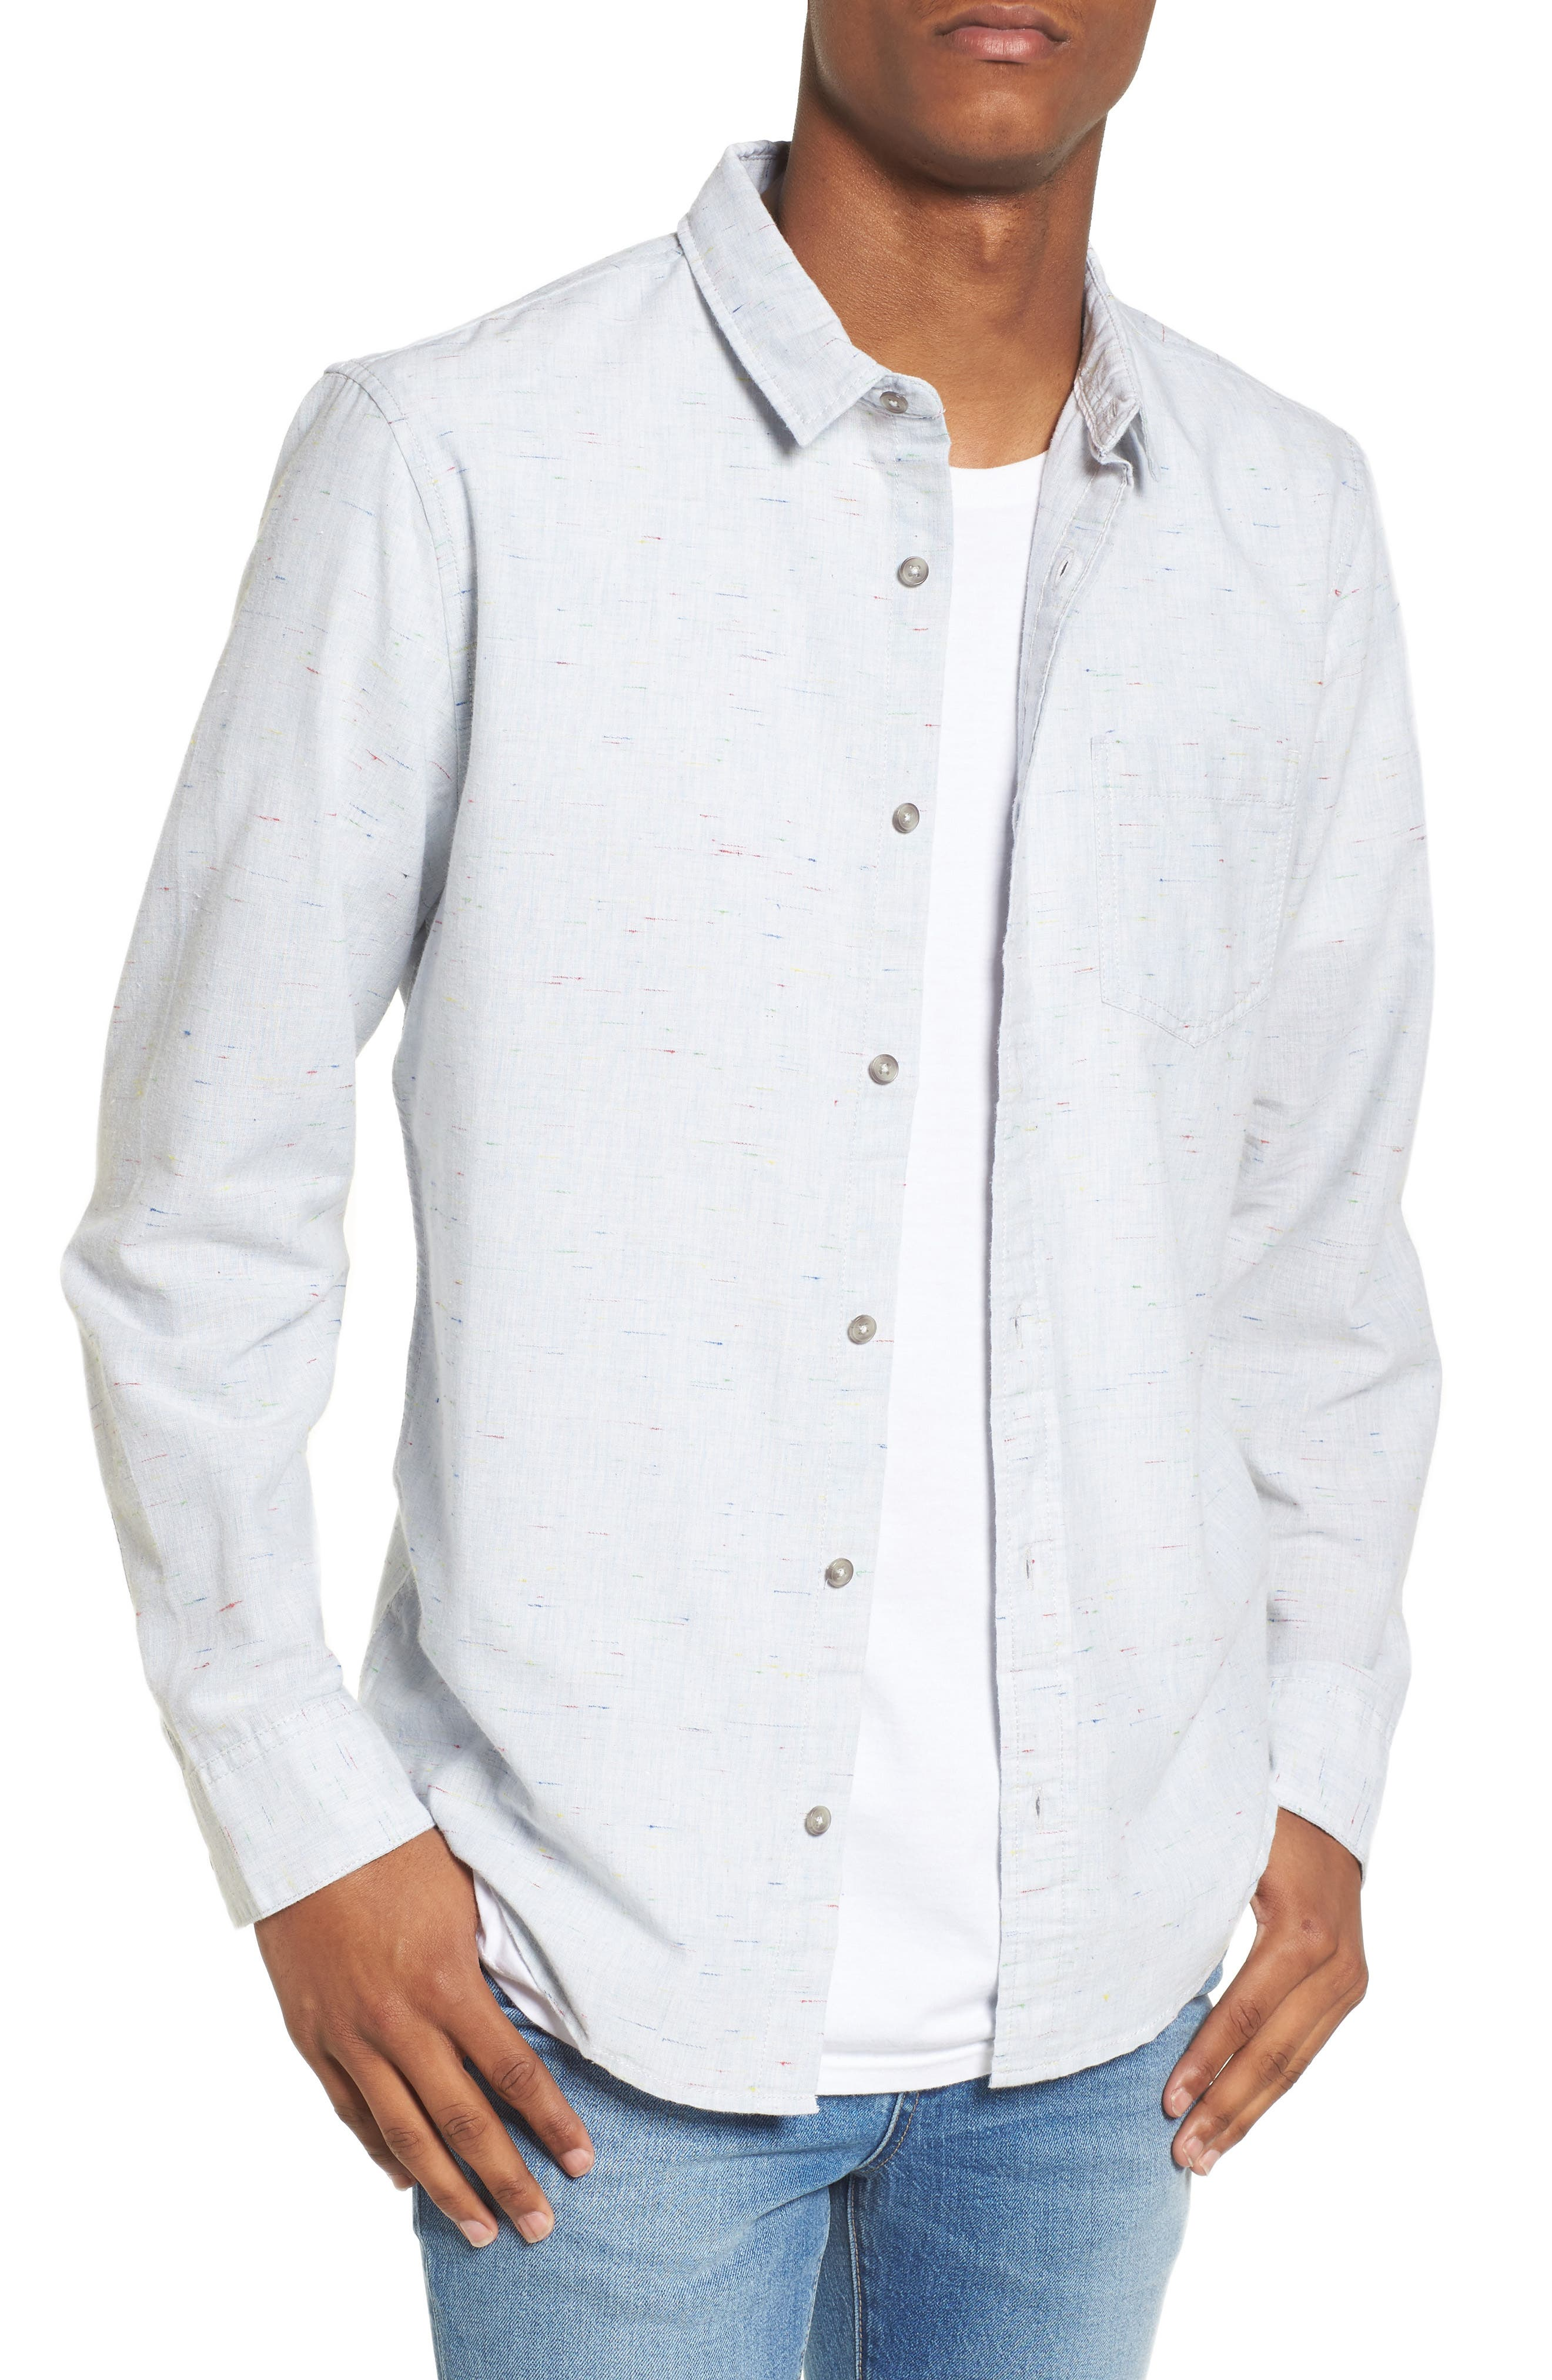 Long Sleeve Color Nep Shirt,                             Main thumbnail 1, color,                             Blue Chambray Multi Nep